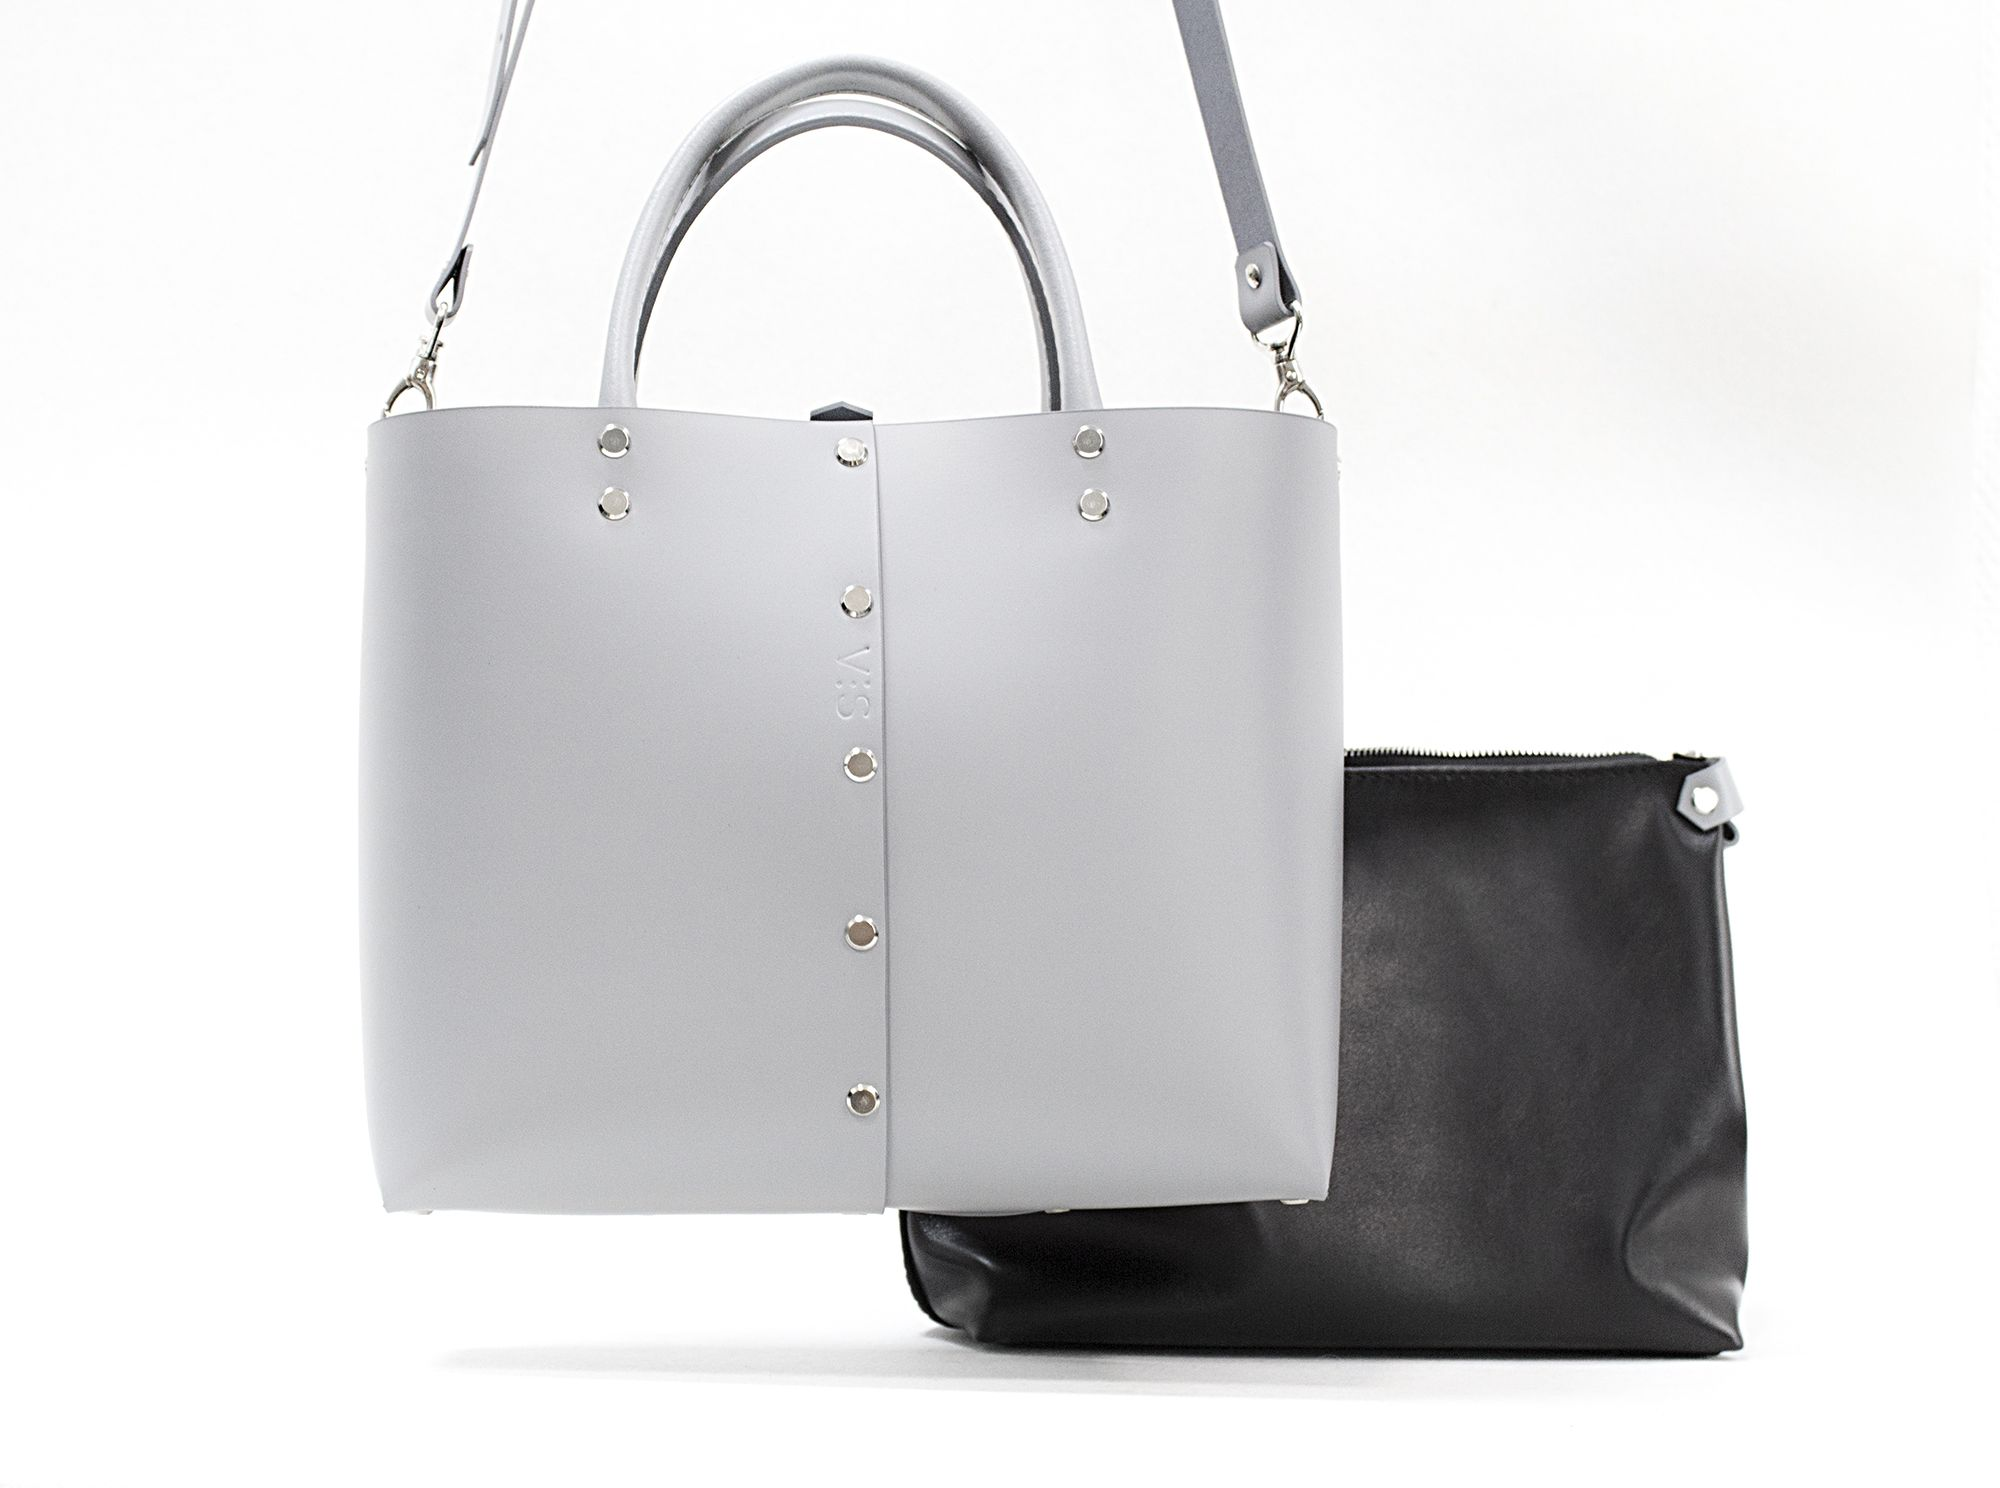 911dfd855767 Leather Tote Bag   VISLeatherBag  VIS Leather Bags   Totebags   Gray bag    Handmade Leather Bag